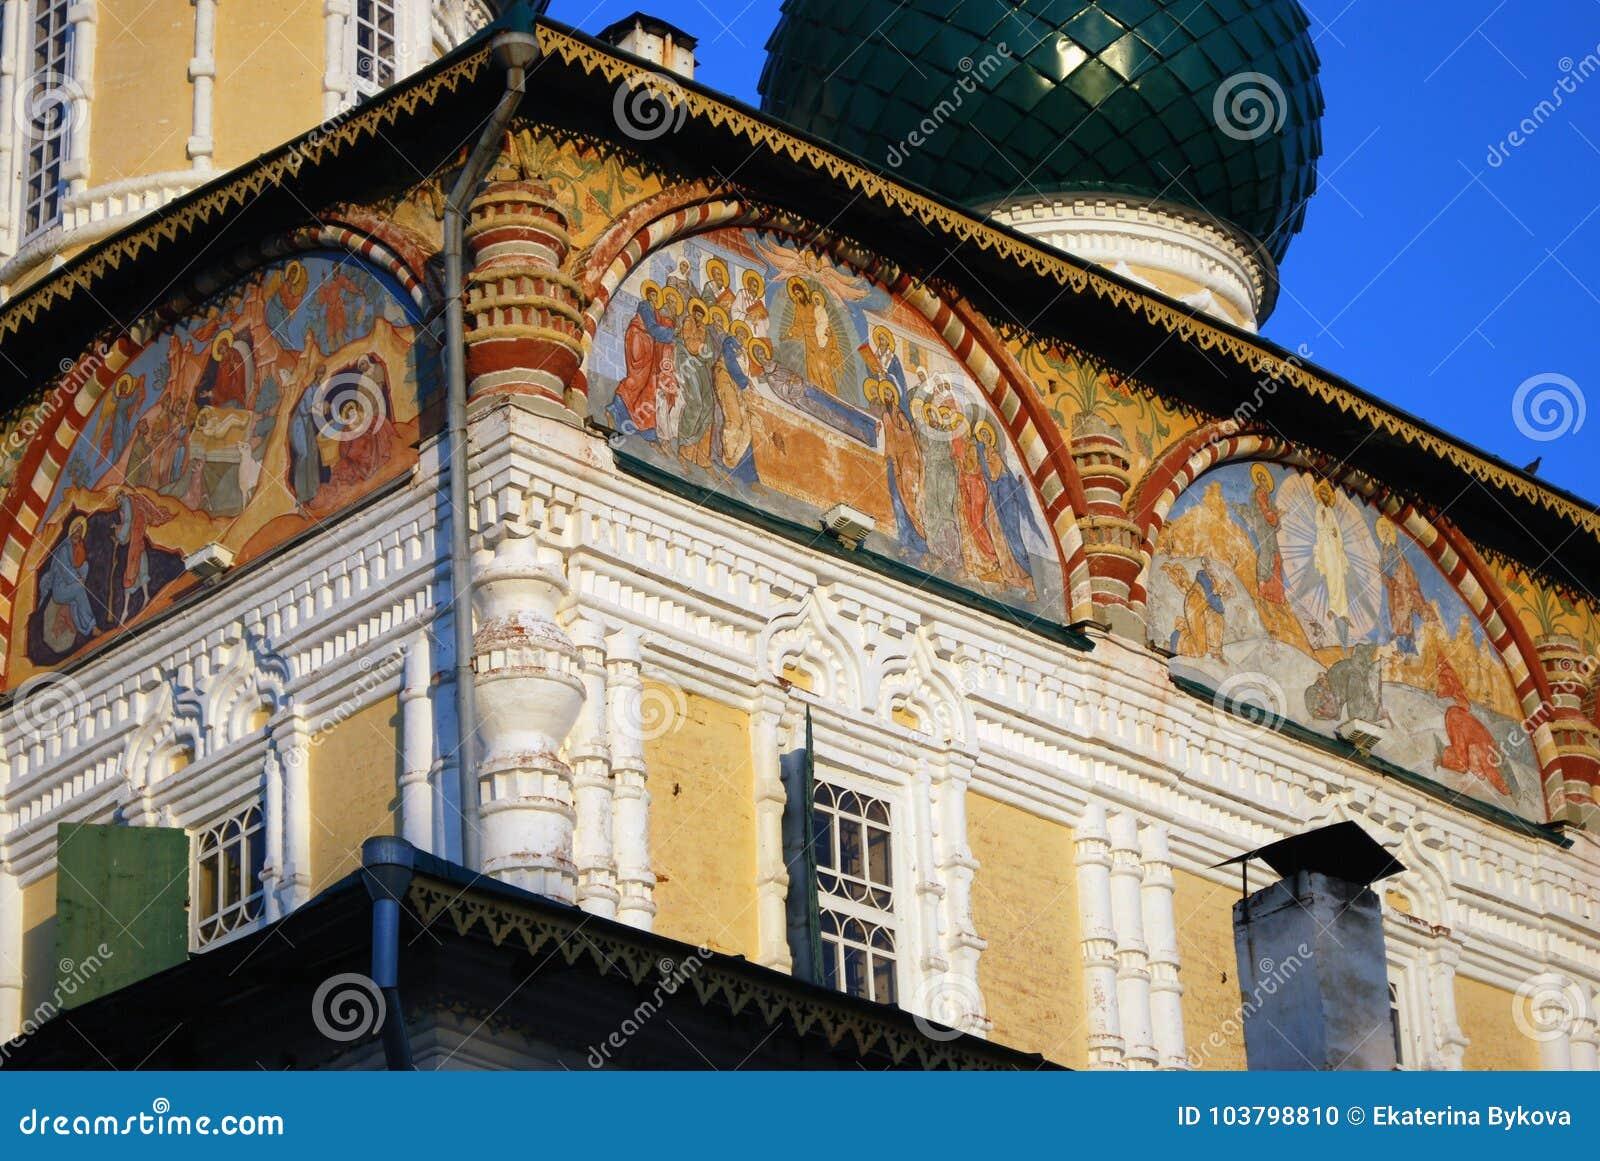 Resurrection Cathedral Tutaev: photos, address and history 50